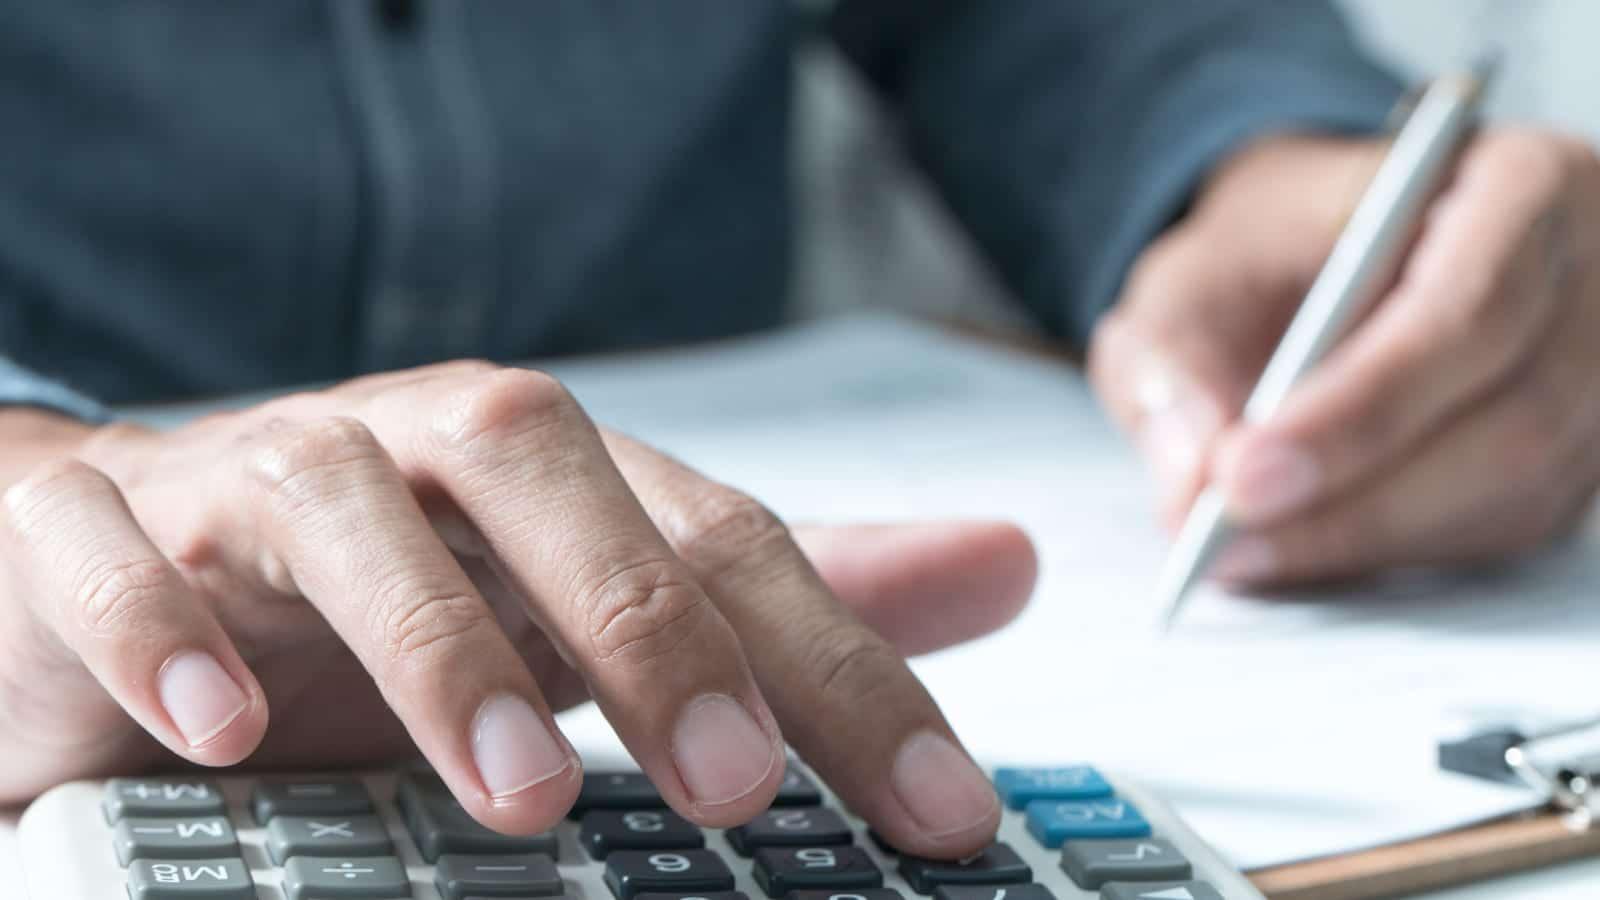 Man Using A Calculator Stock Photo